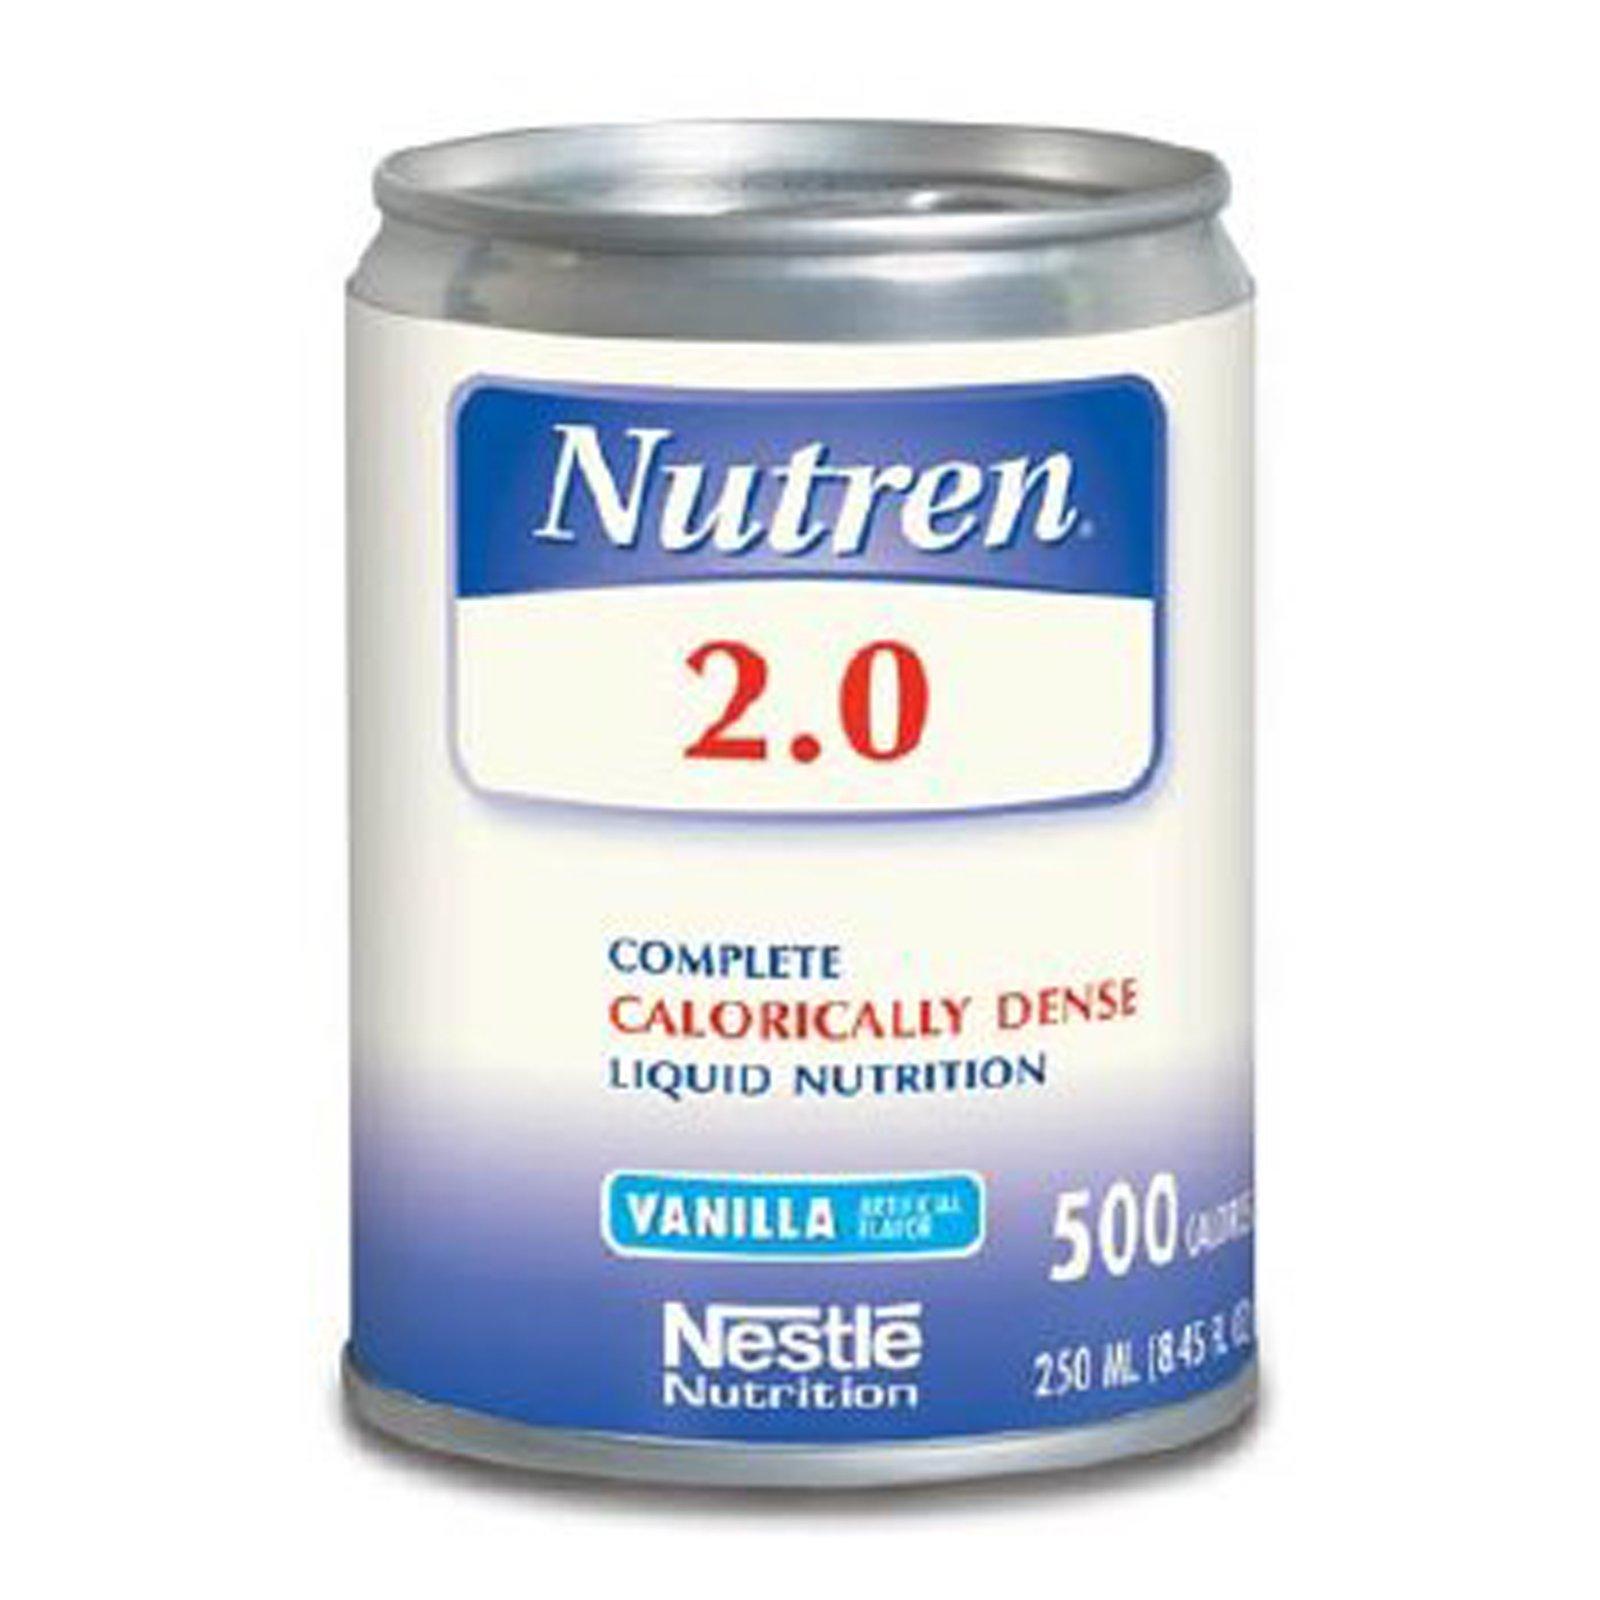 Nutren 2.0 Complete Calorically Dense Liquid Nutrition Vanilla, 24-8.45 oz, Pack of 4